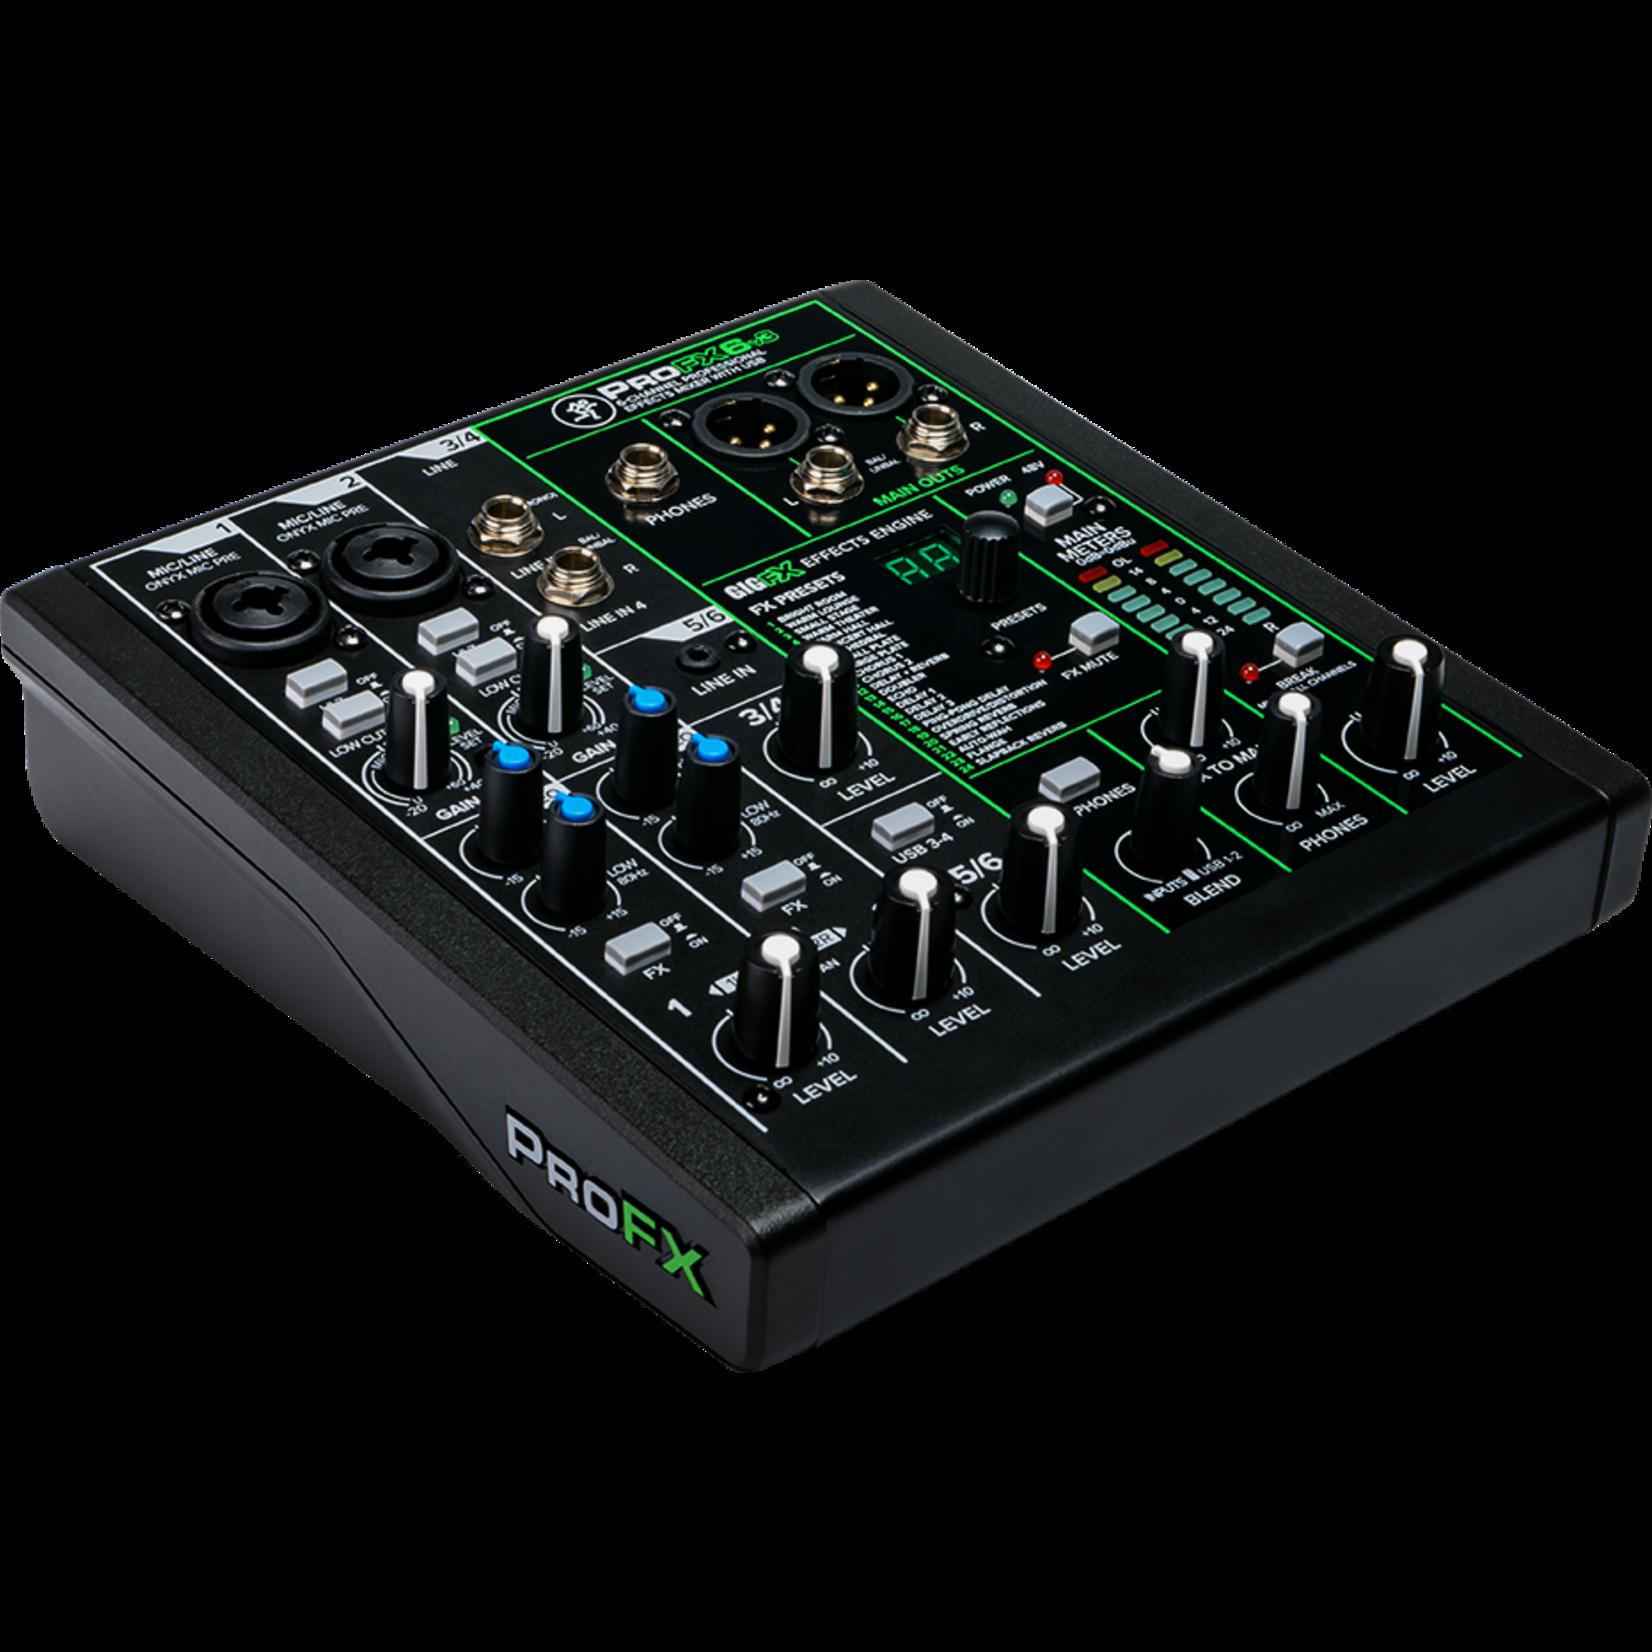 MACKIE PROFX6V3 console